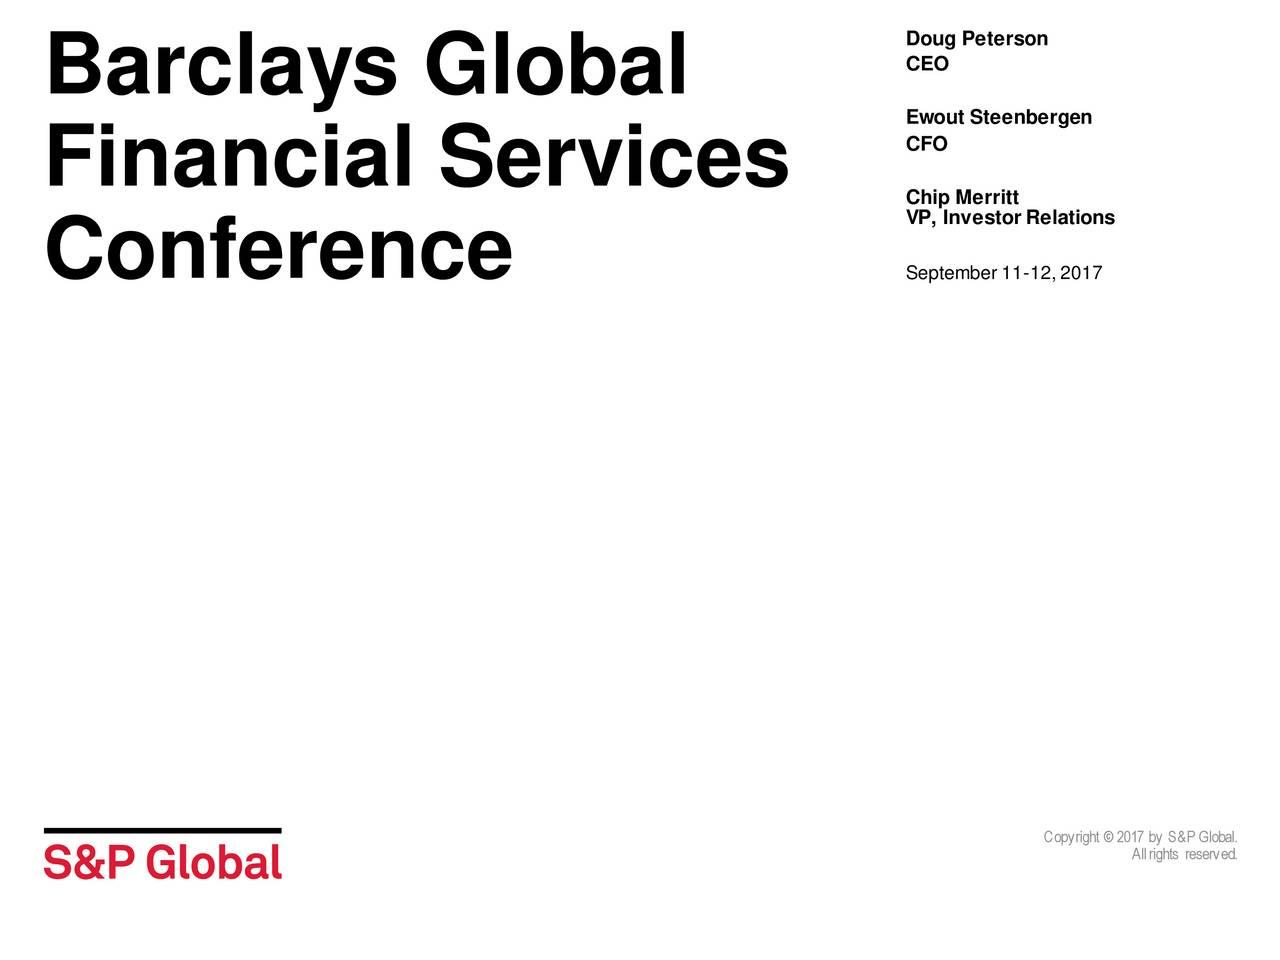 S&P Global (SPGI) Presents At Barclays 2017 Global